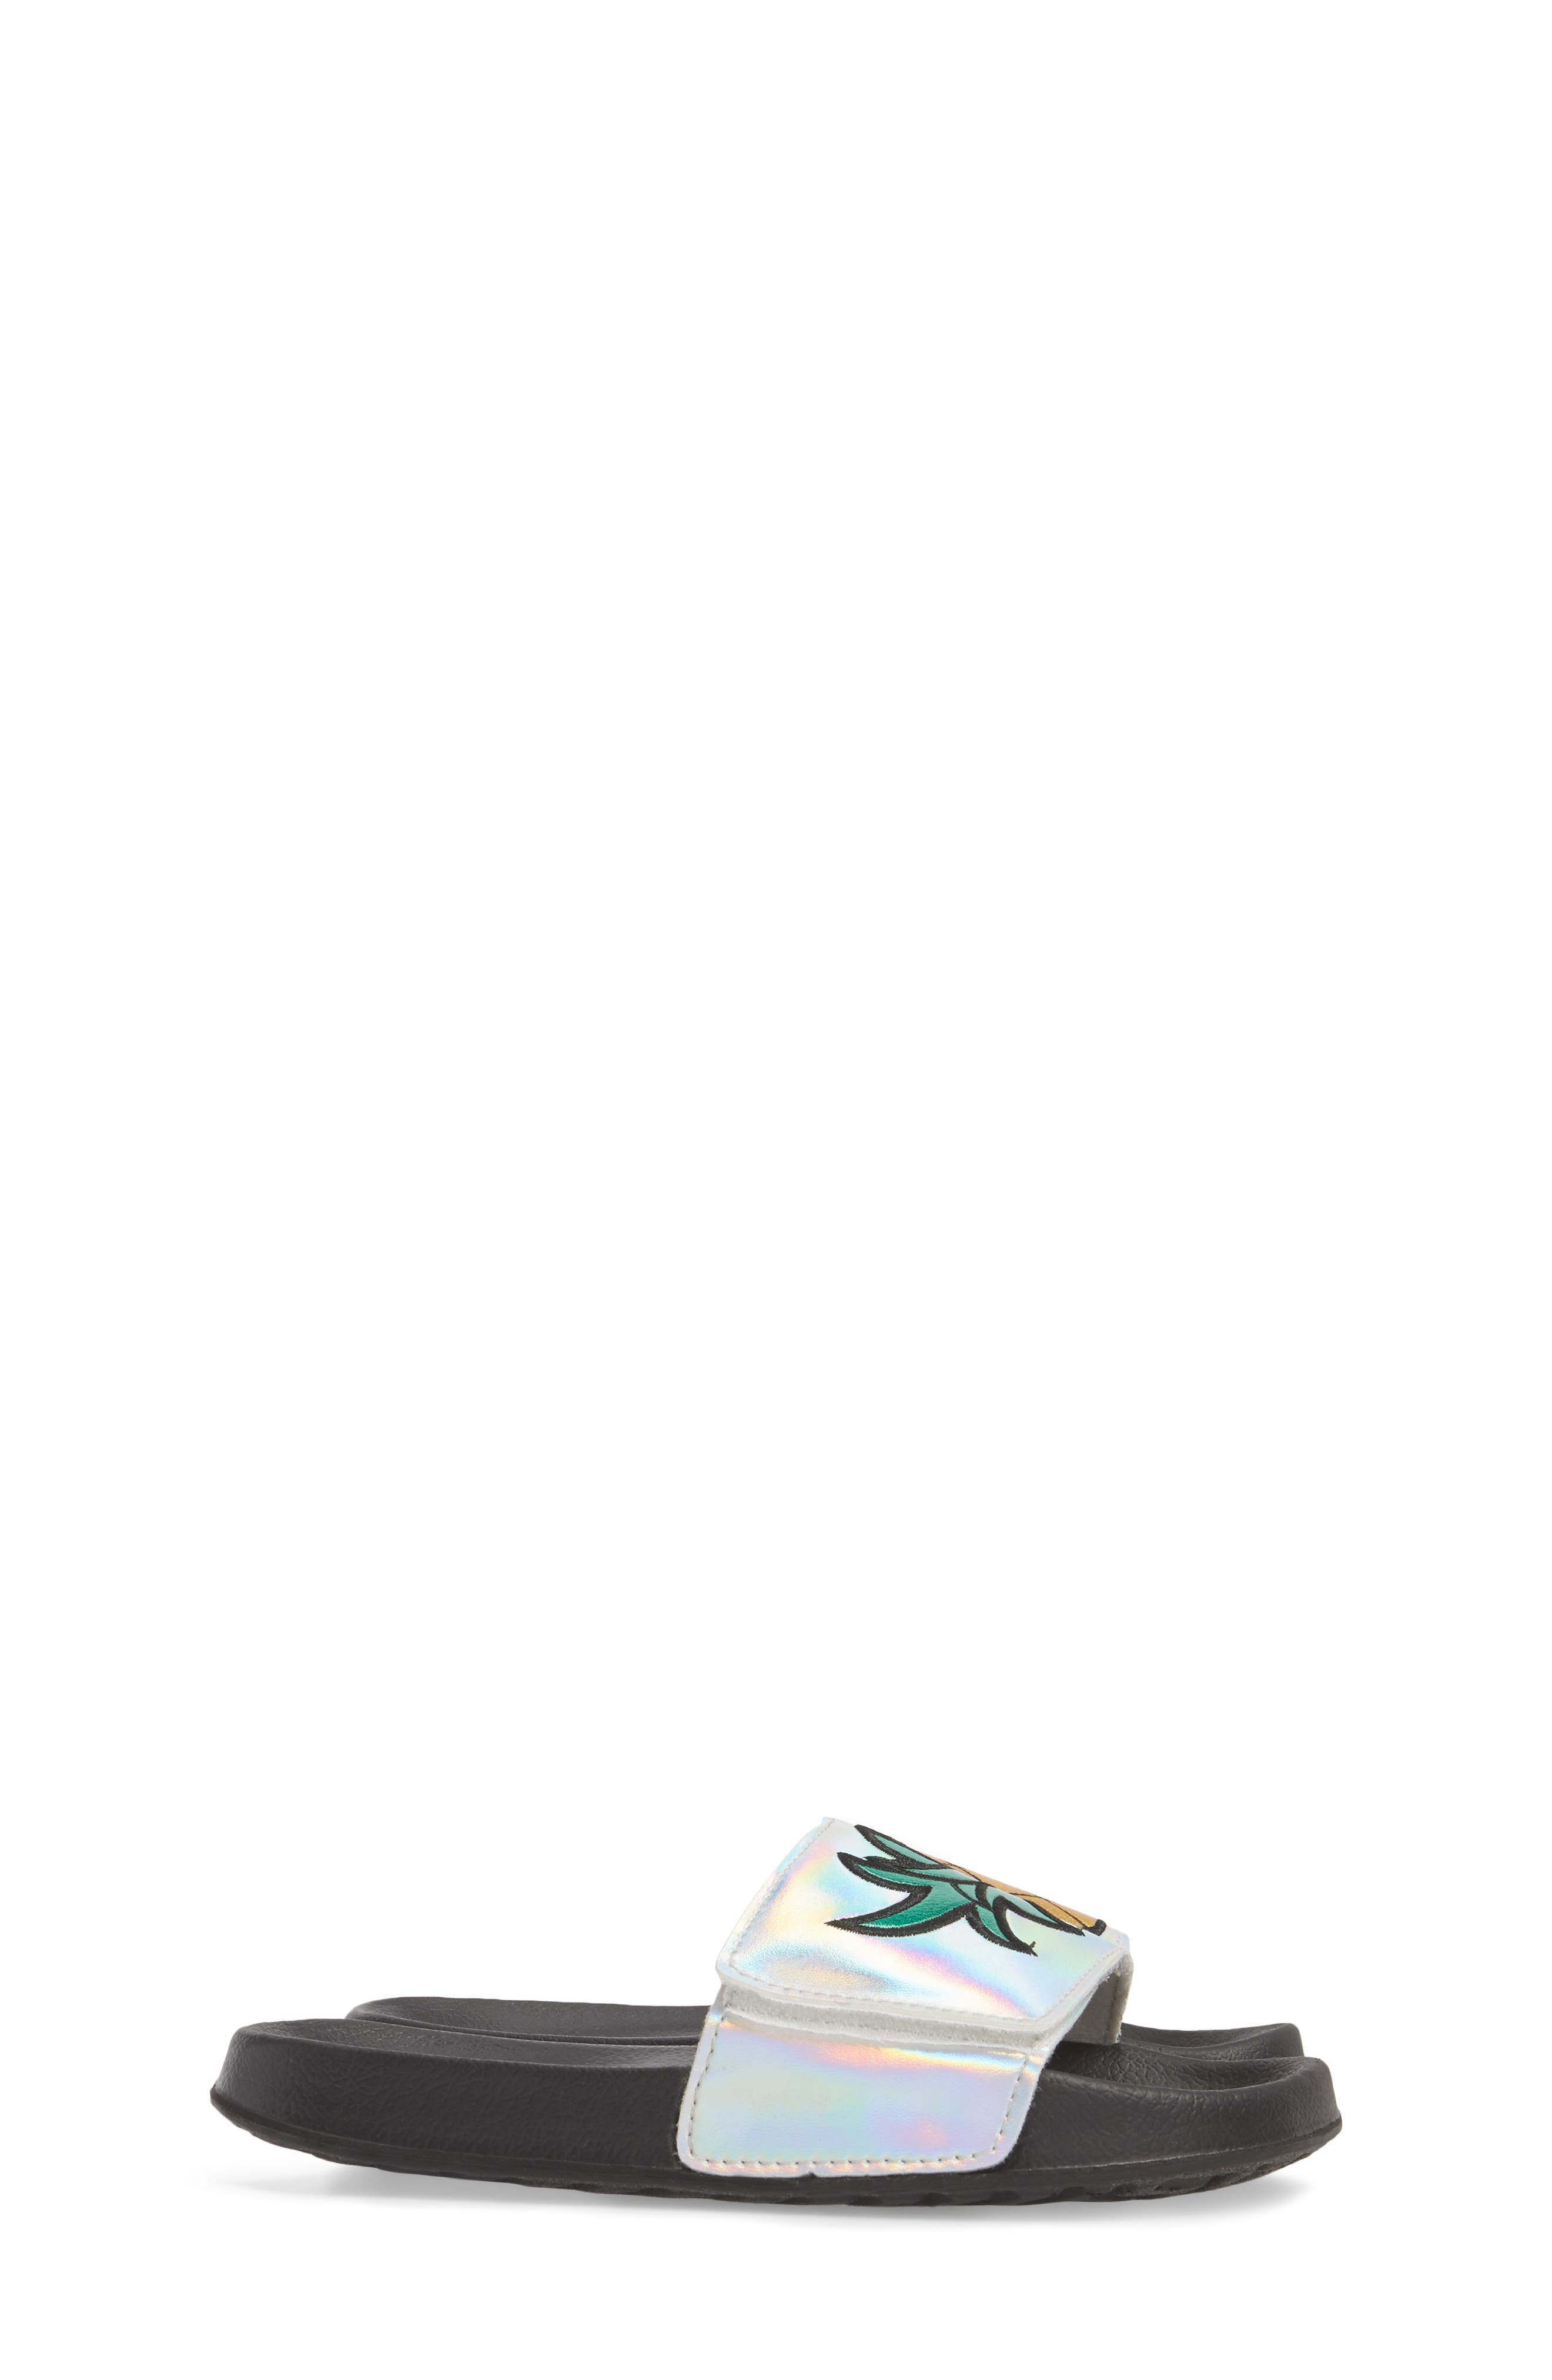 Mackie Pineapple Metallic Slide Sandal,                             Alternate thumbnail 4, color,                             Silver Holographic Leather